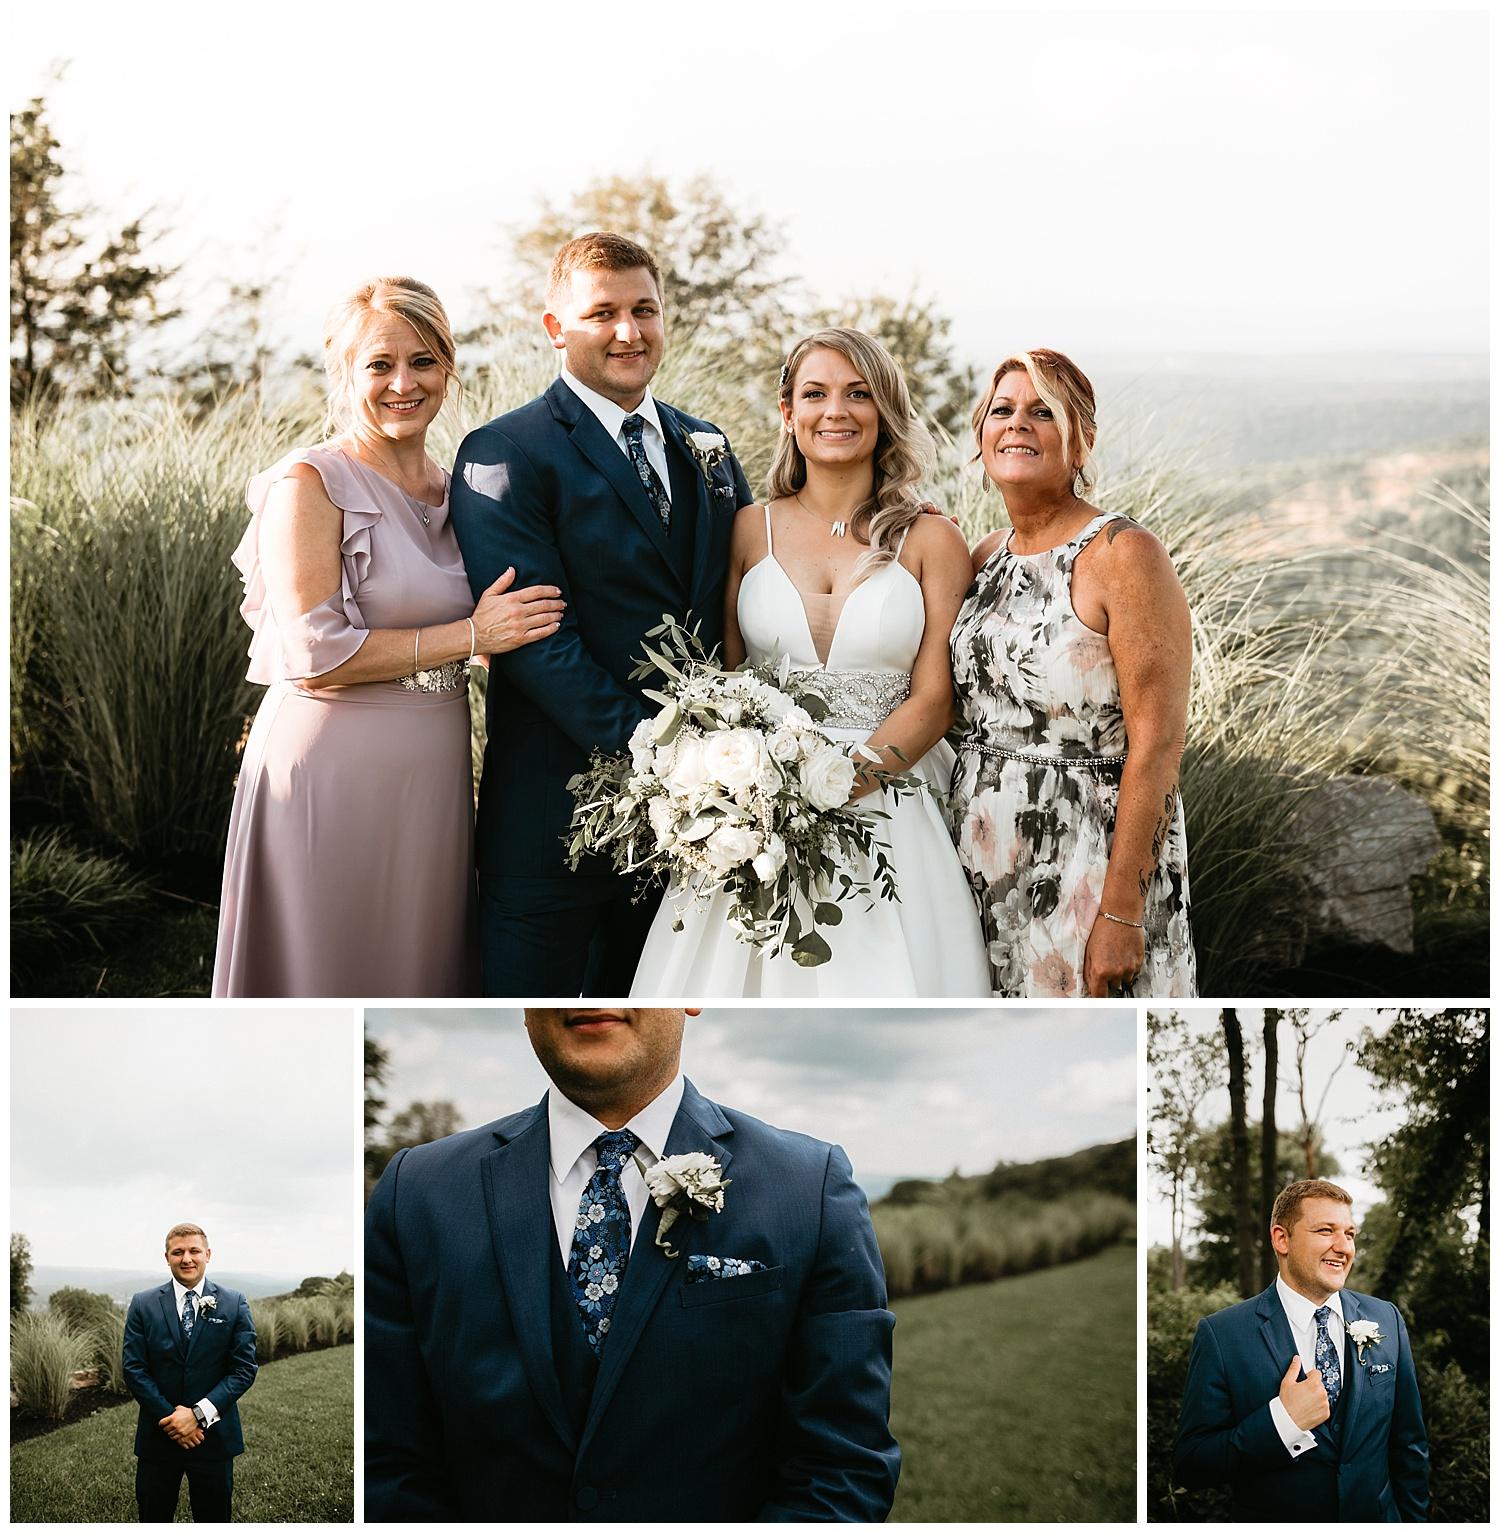 Destination-Wedding-Photographer-in-NEPA-Palmerton-PA_0022.jpg